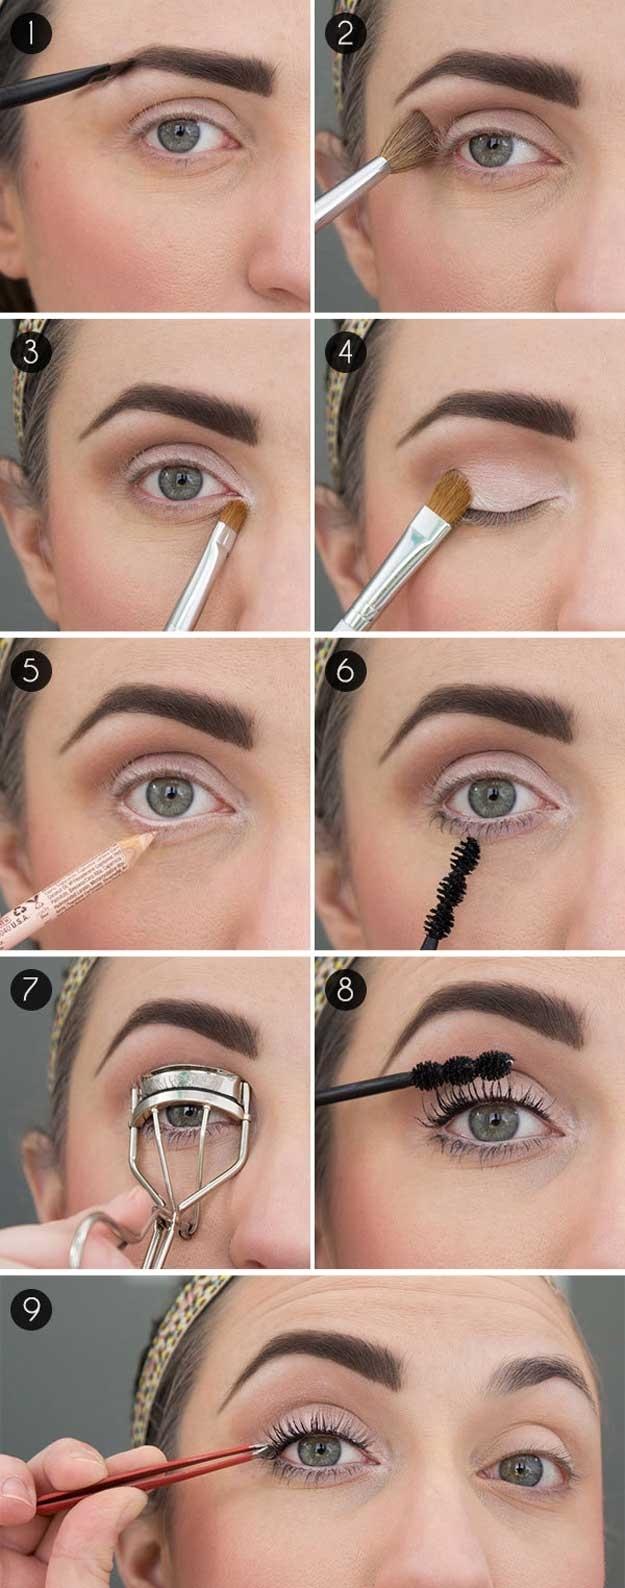 35 Wedding Makeup For Blue Eyes - The Goddess intended for Wedding Makeup Blue Eyes